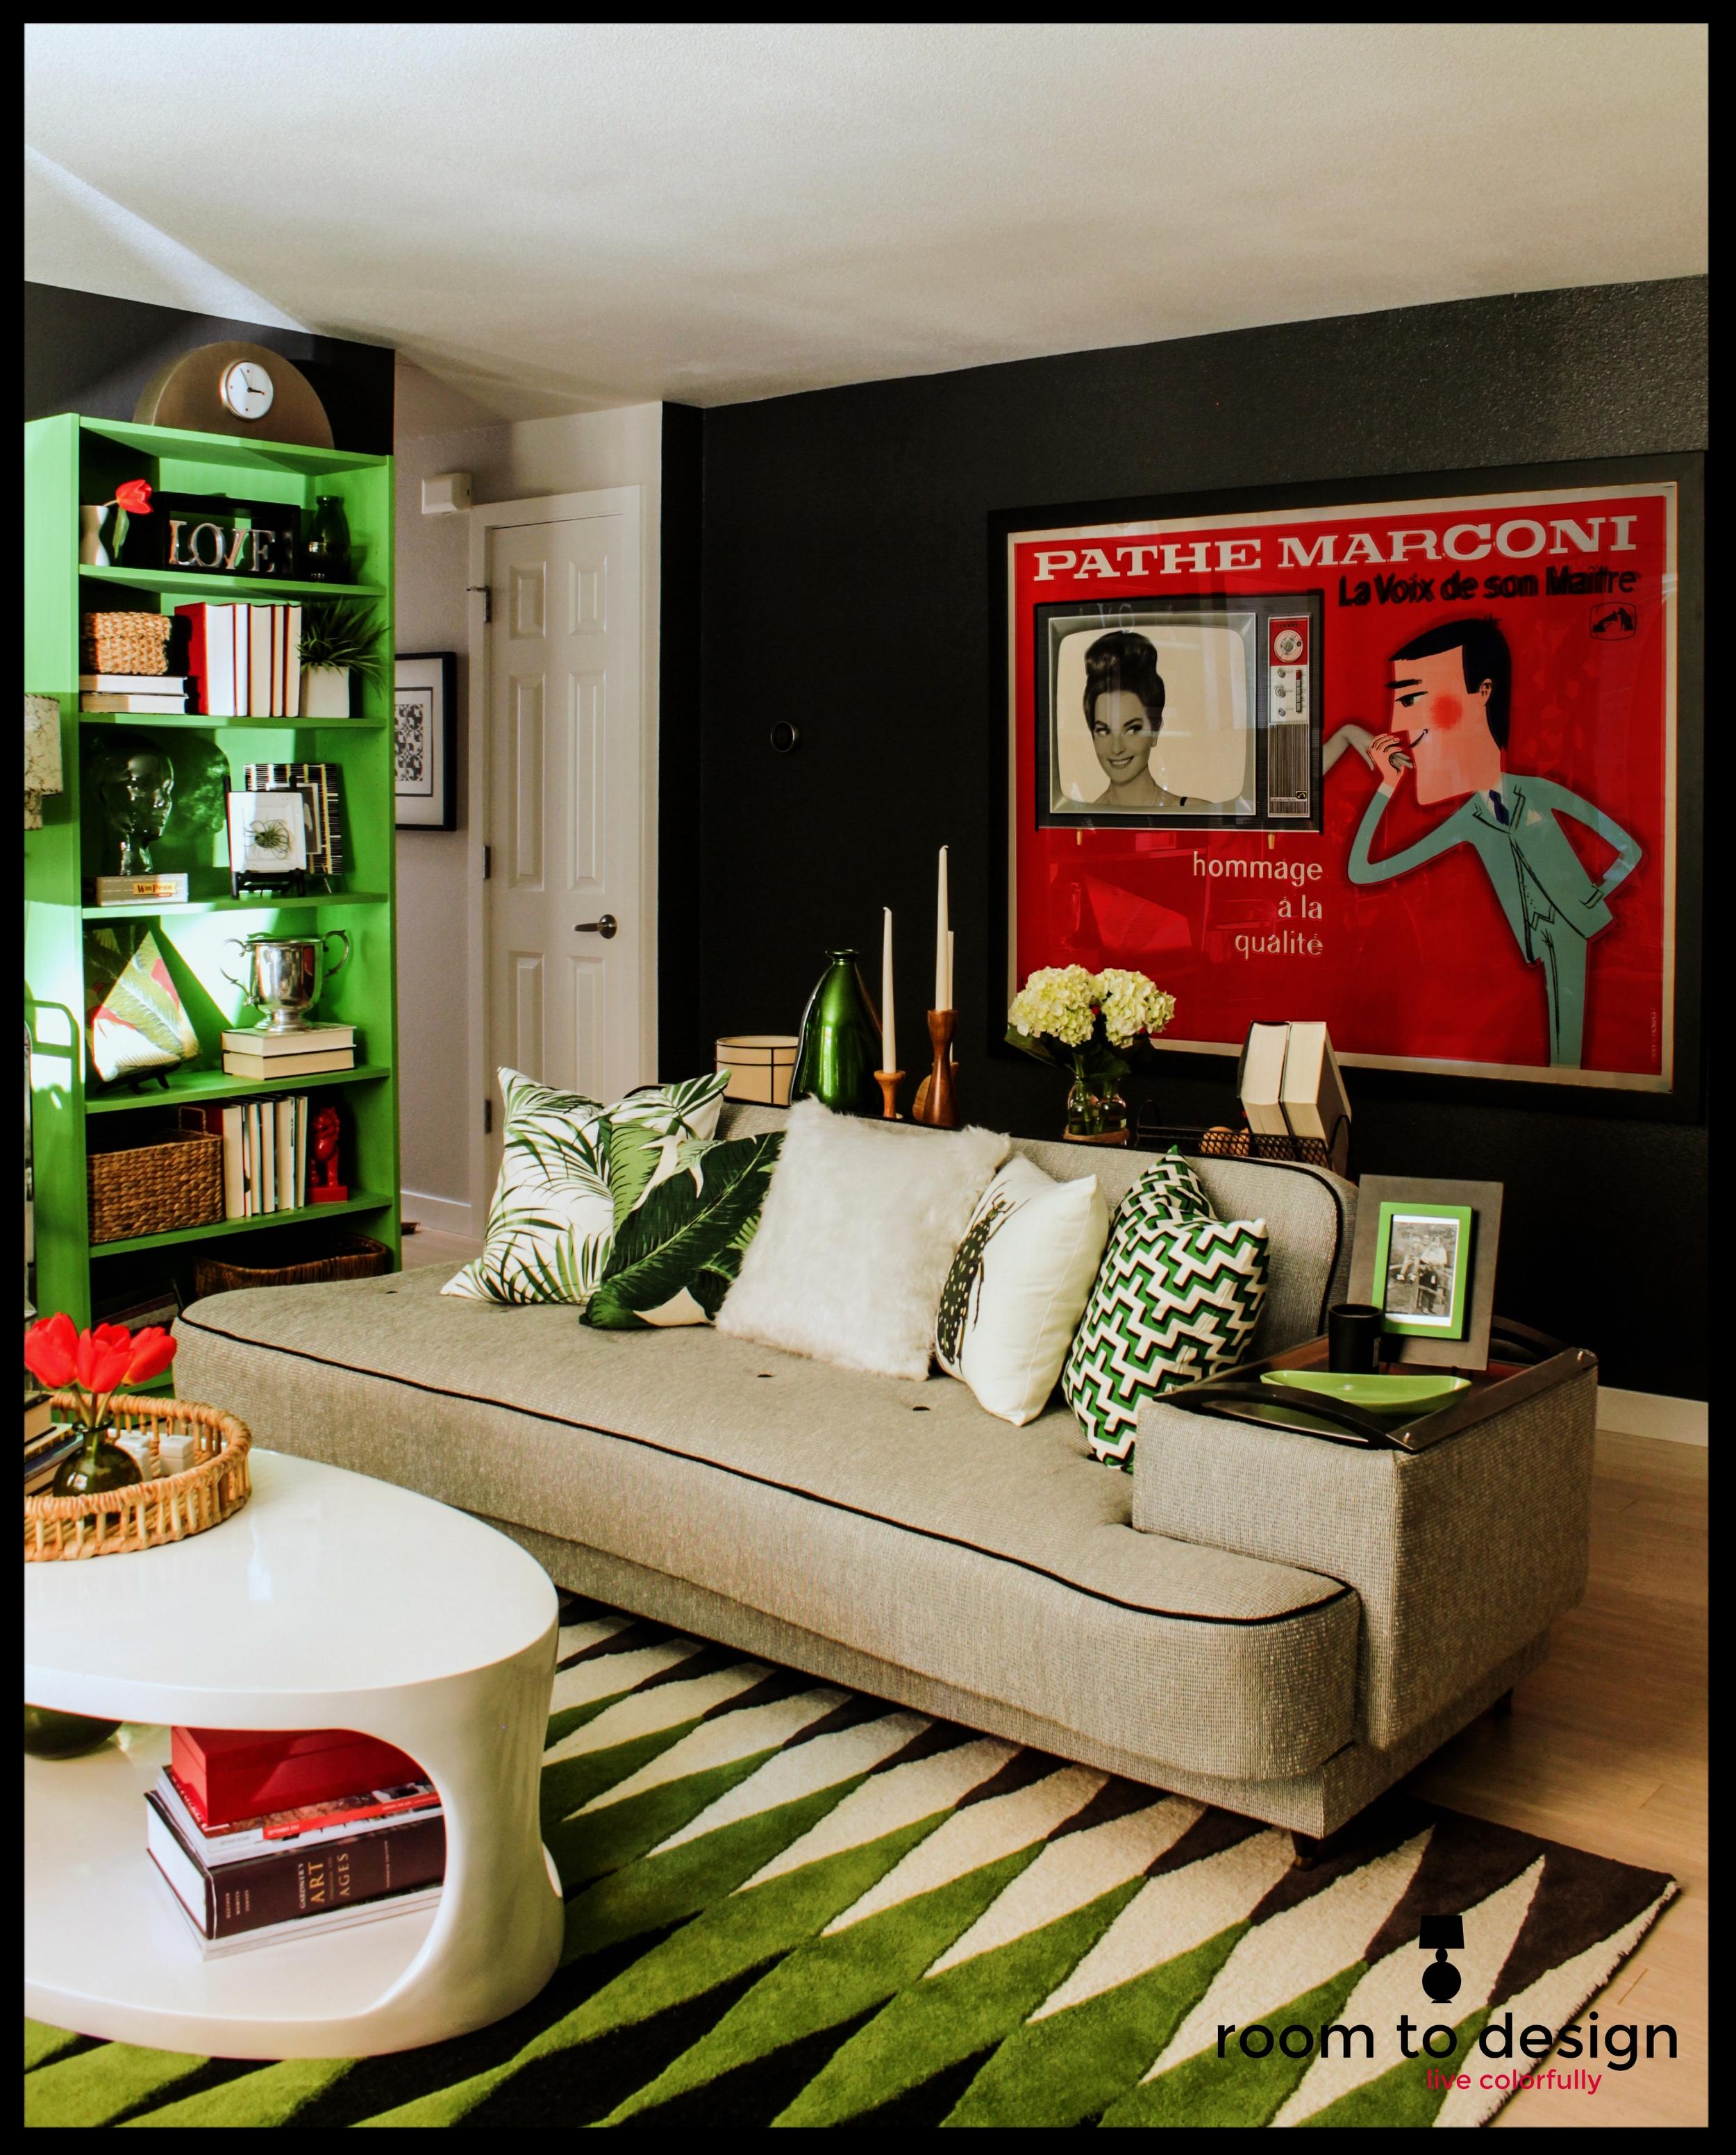 large-artwork-interior-design-1.jpg